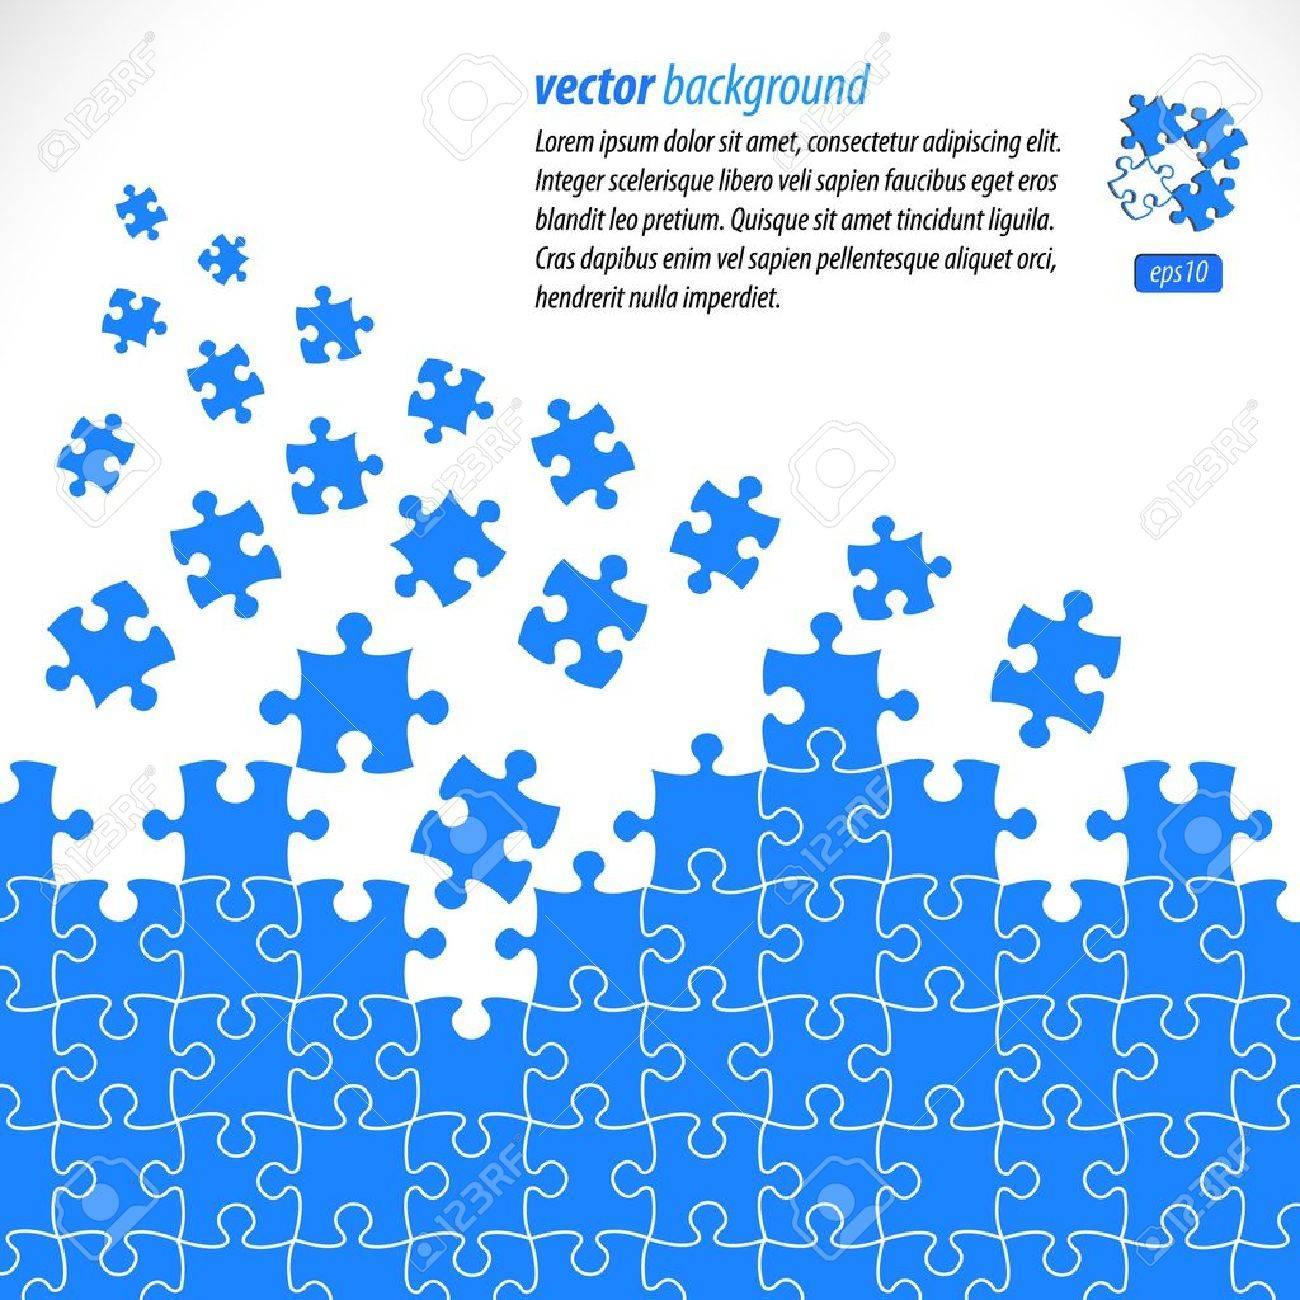 Puzzle Pieces Vector Design Royalty Free Cliparts, Vectors, And ...